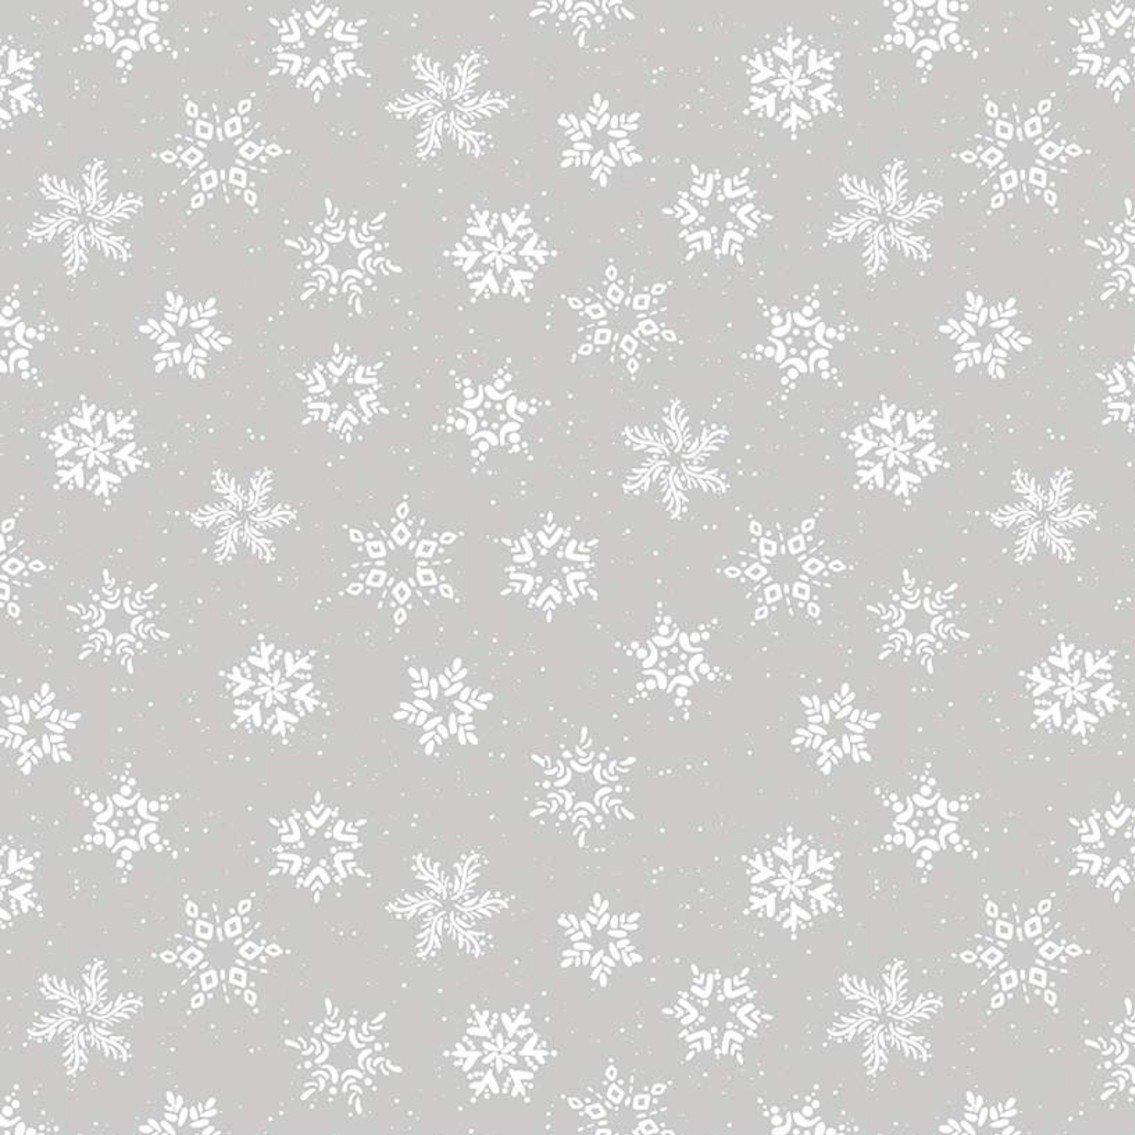 Amanda Castor Winterland - Snowflakes (Gray)